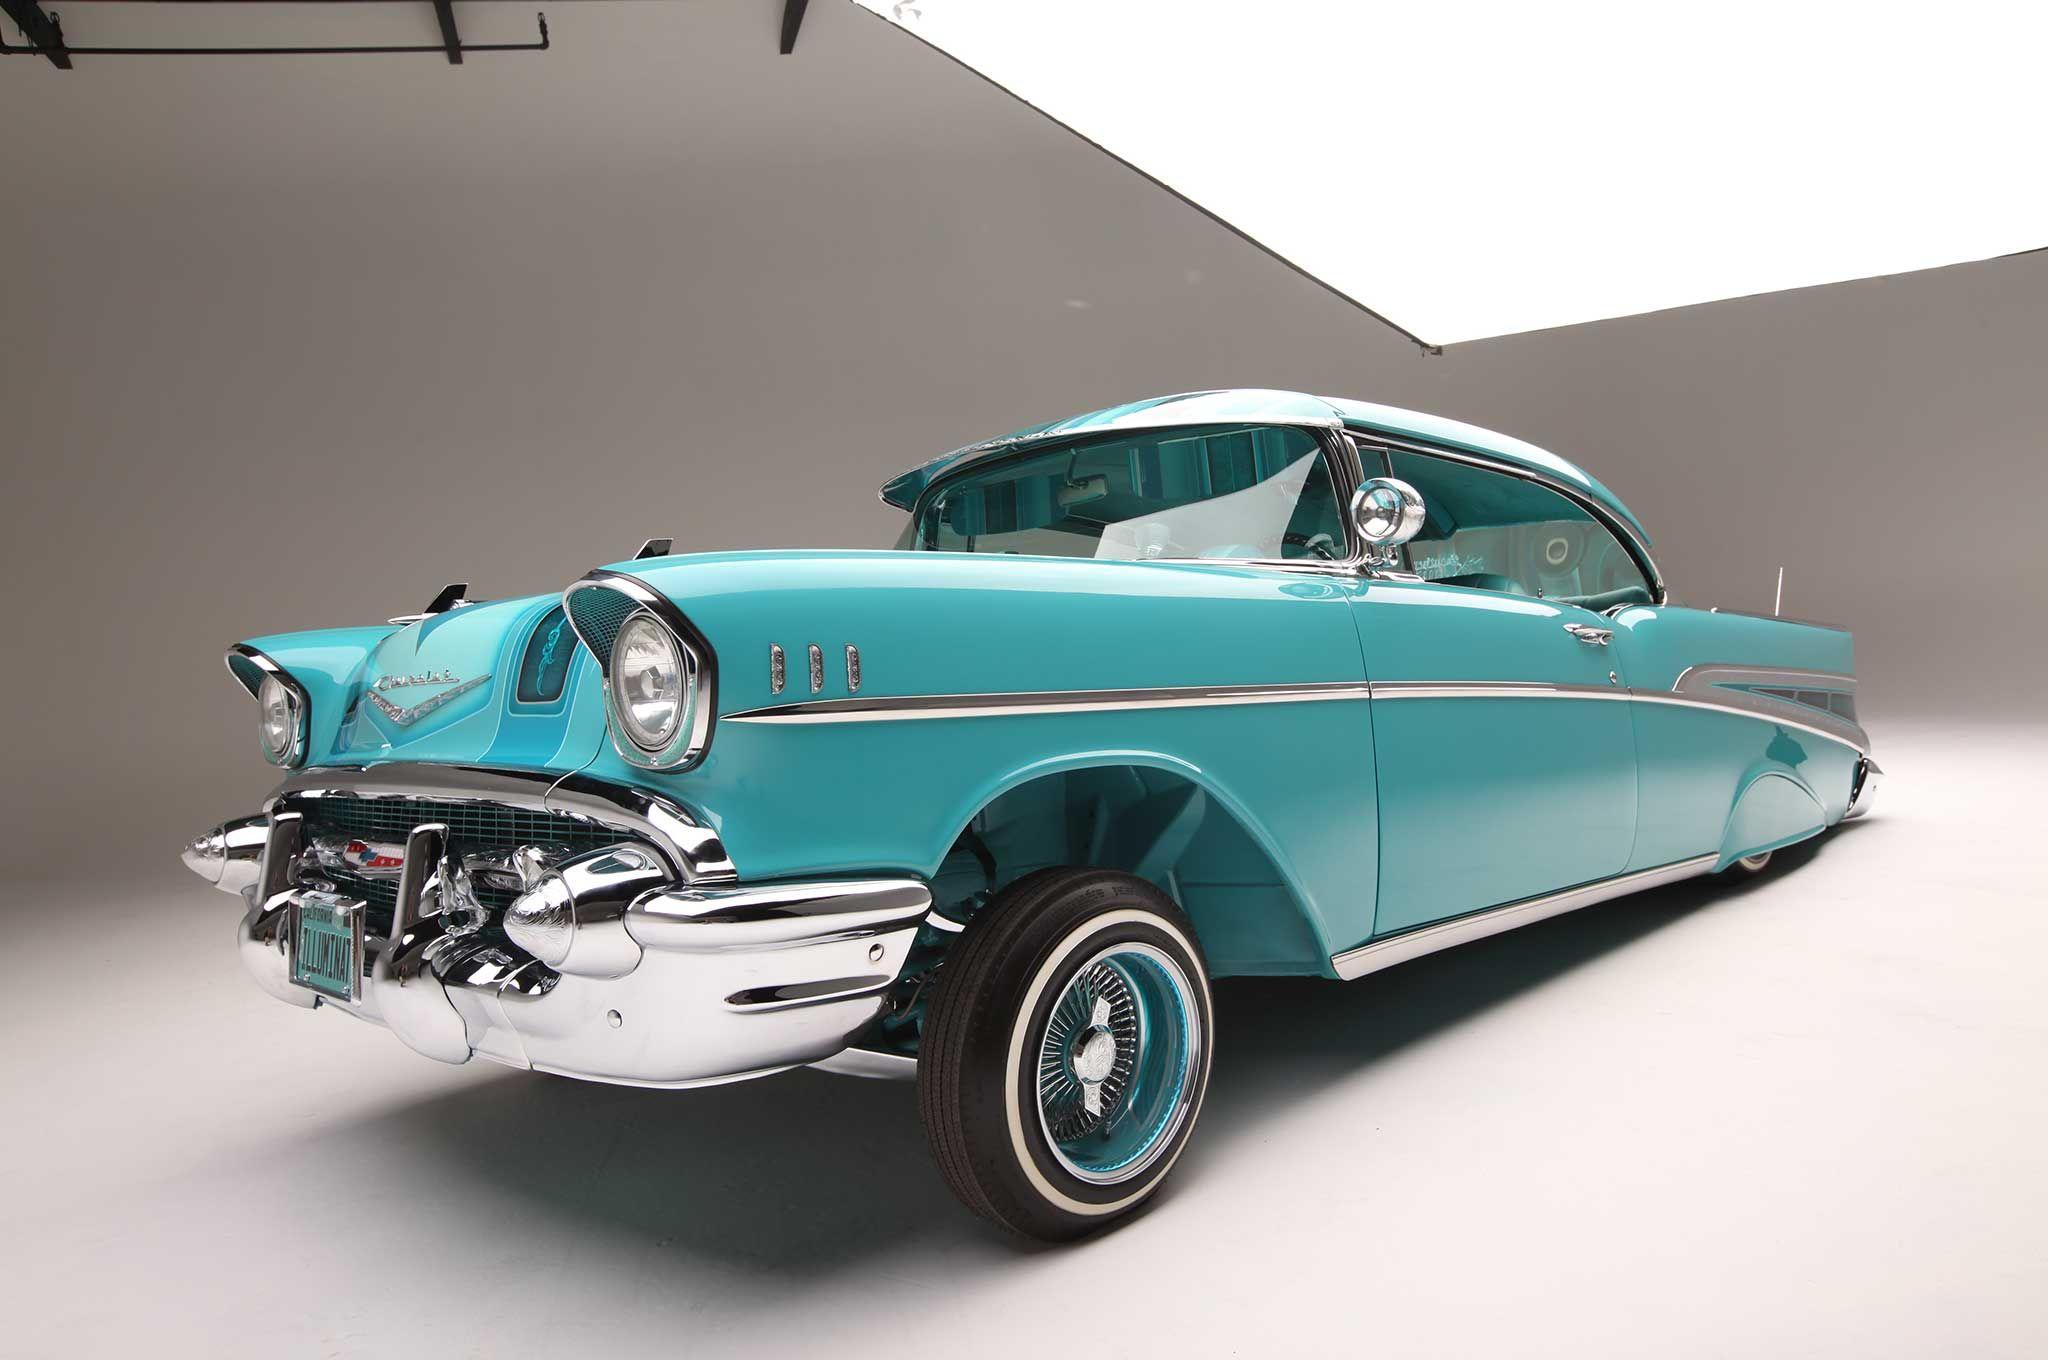 1957 CHEVROLET BEL AIR – MODERN-DAY MONARCH | 57 Bel Air Dream ...